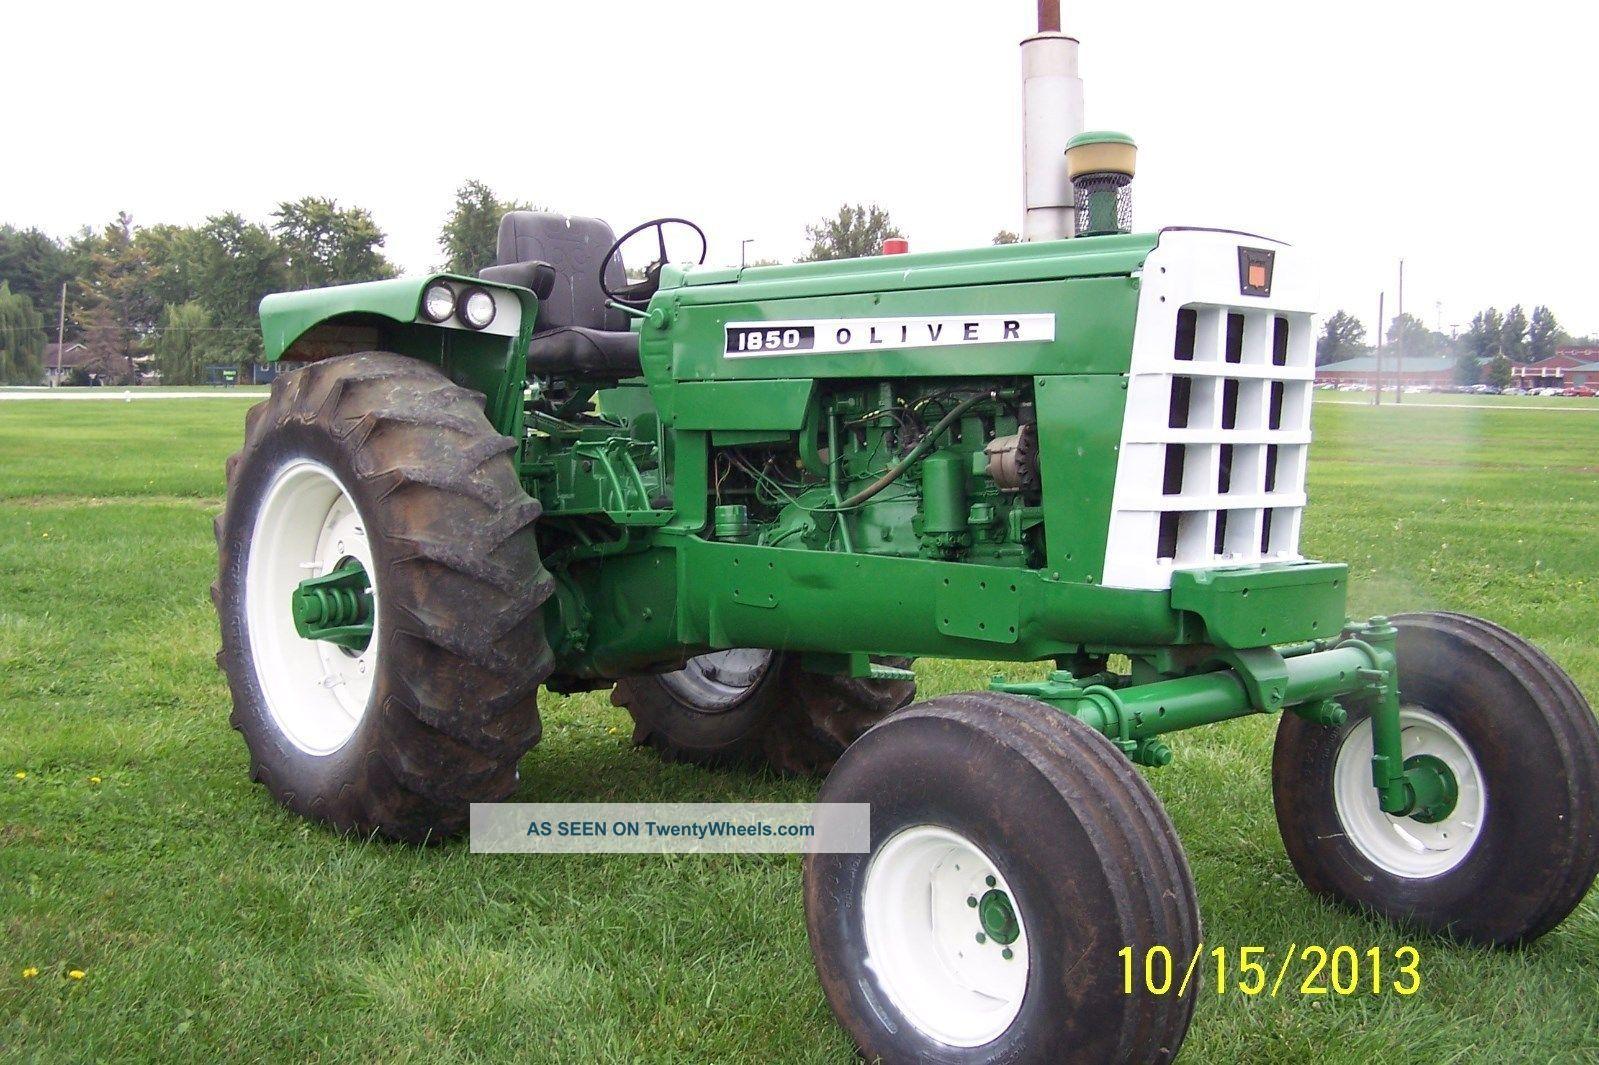 Oliver 1850 tractor tractors photo tractors pinterest - Craigslist farm and garden minneapolis ...